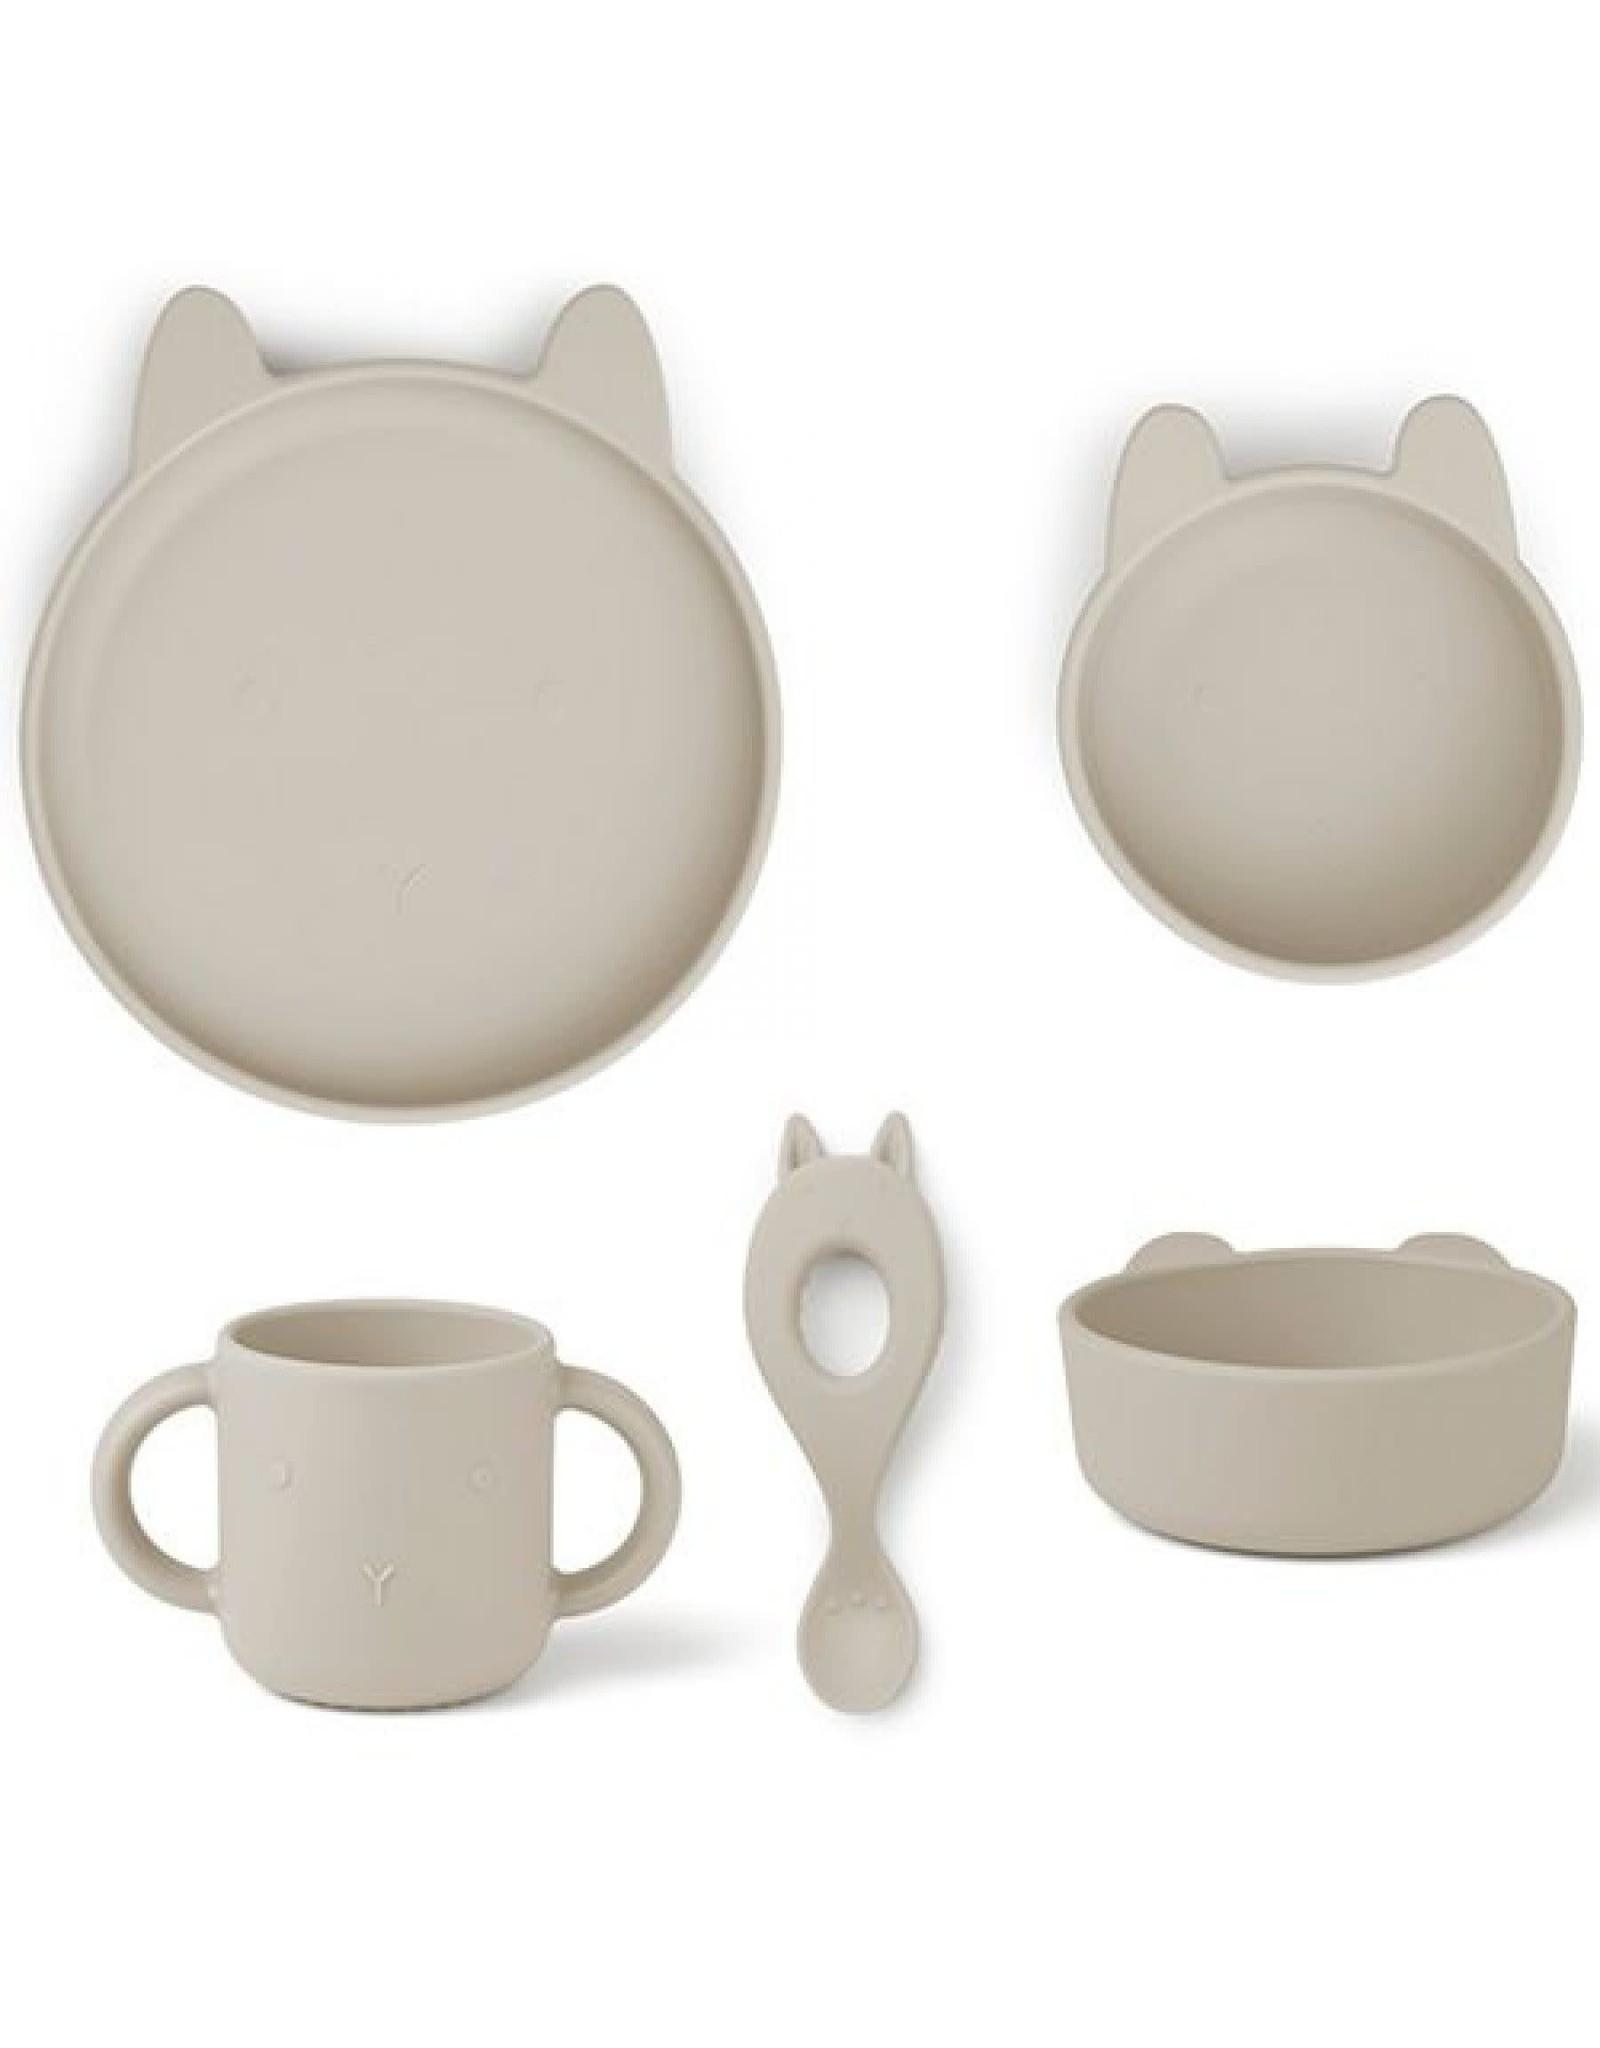 Liewood Vivi Silicone Tableware - 4 Pack - Rabbit Sandy